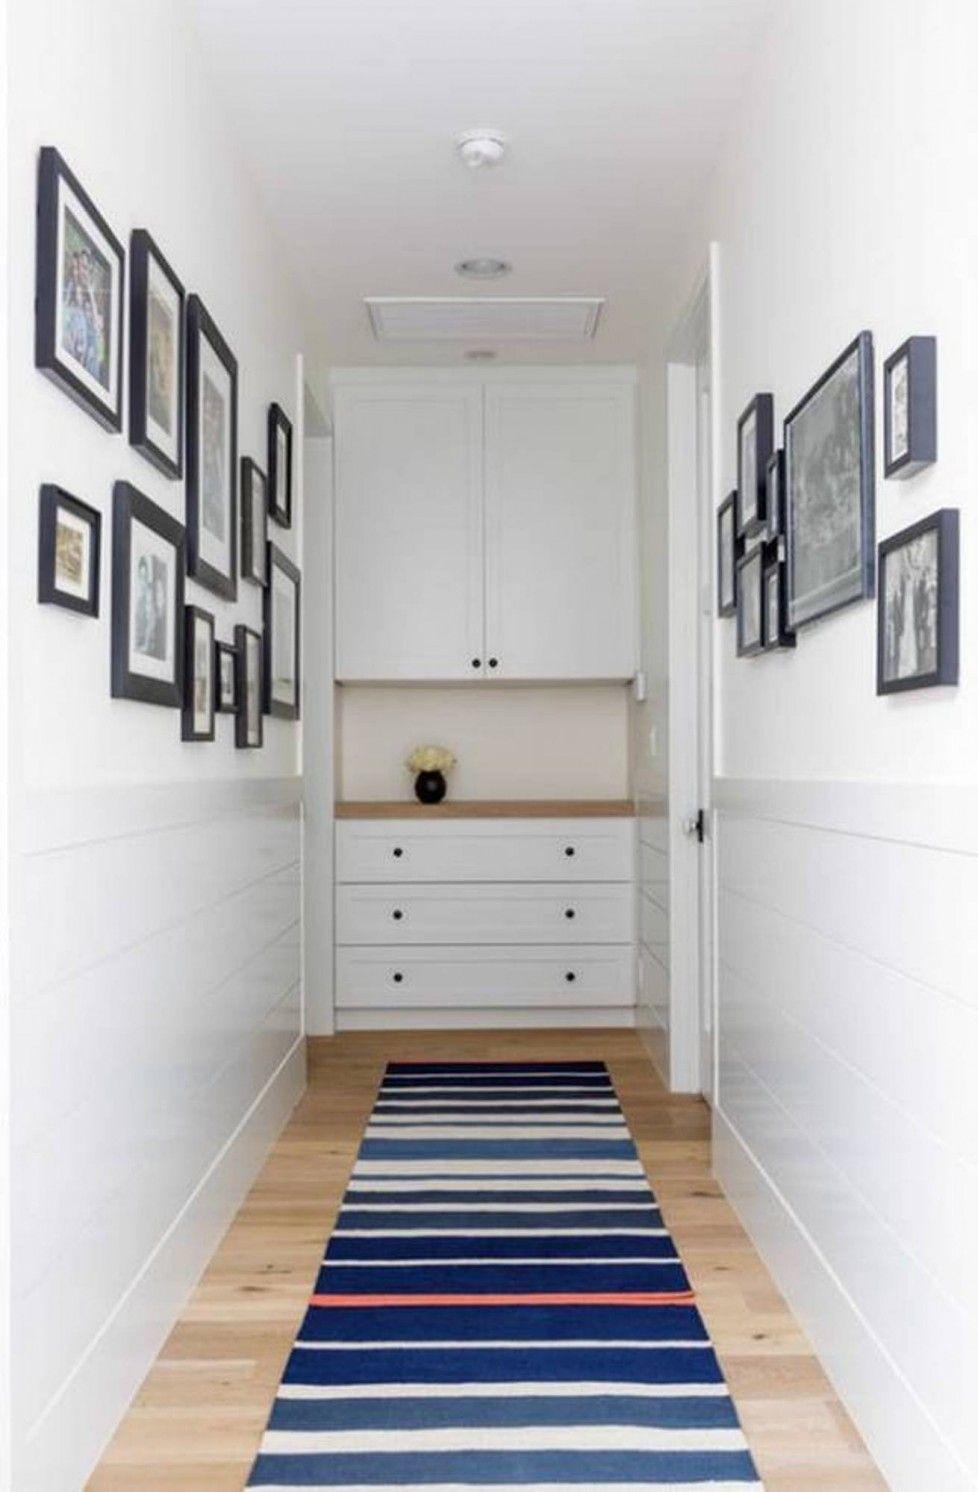 50 Ways to Spruce Up Your Hallway | Wall galleries, Hallway ...